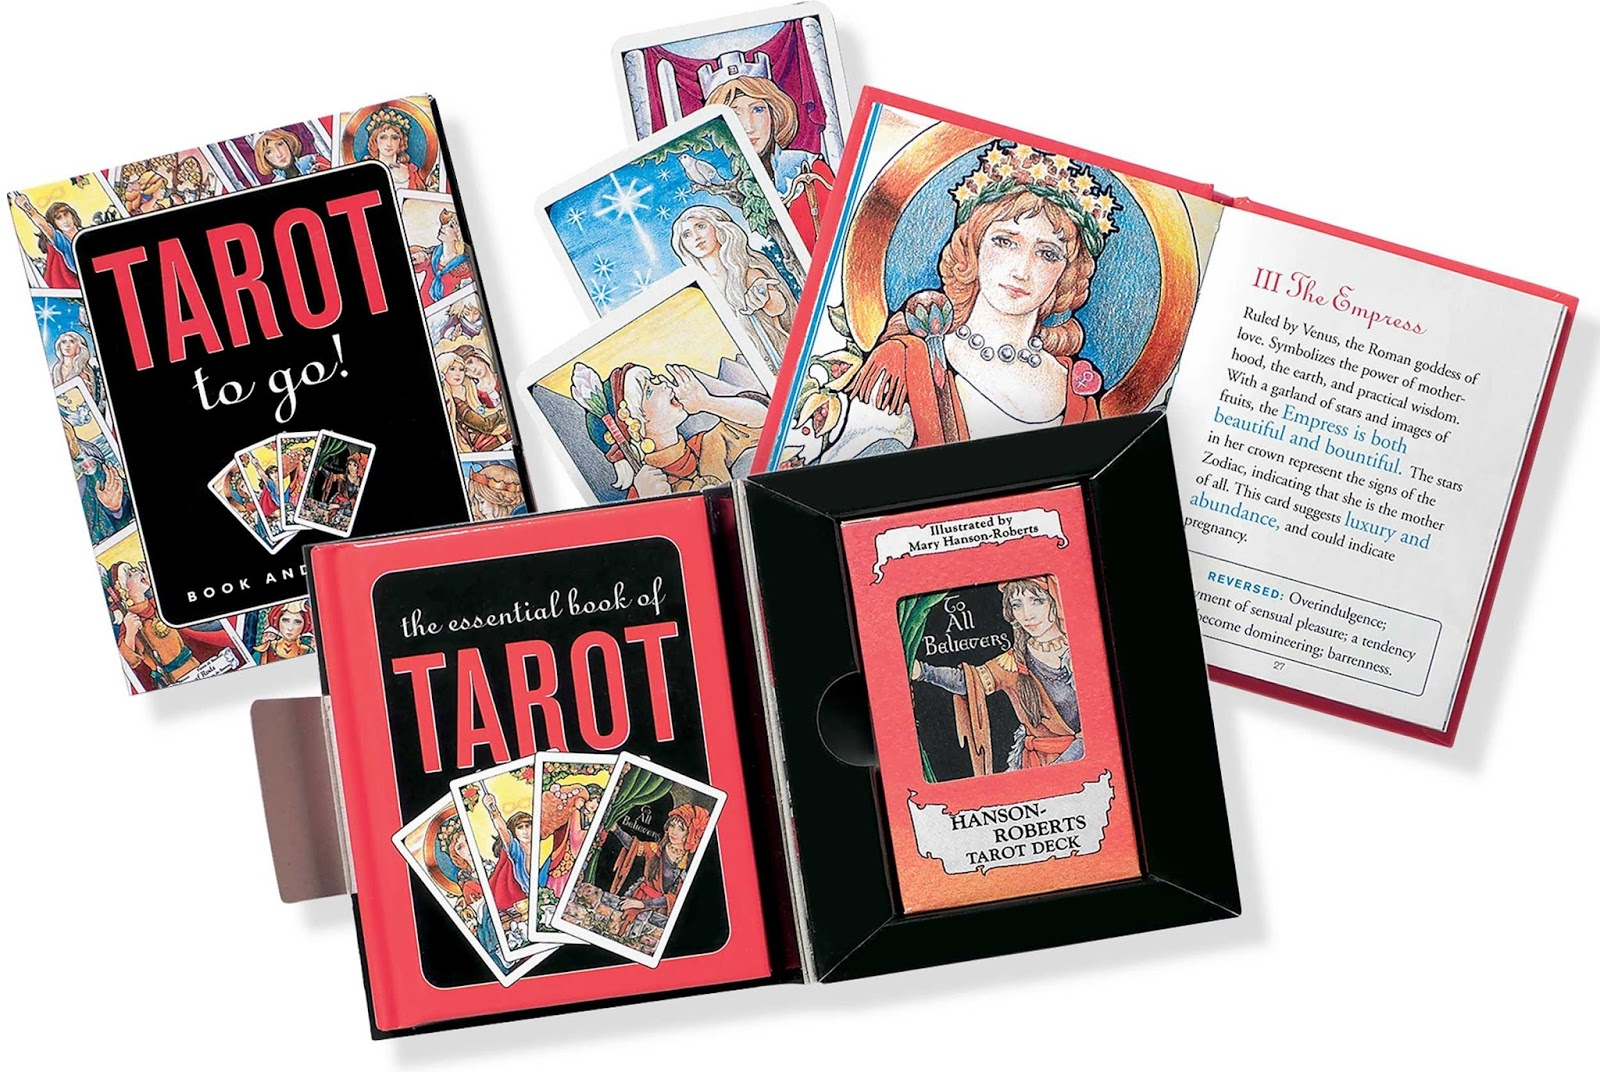 Tarot to go 9780880882491_2